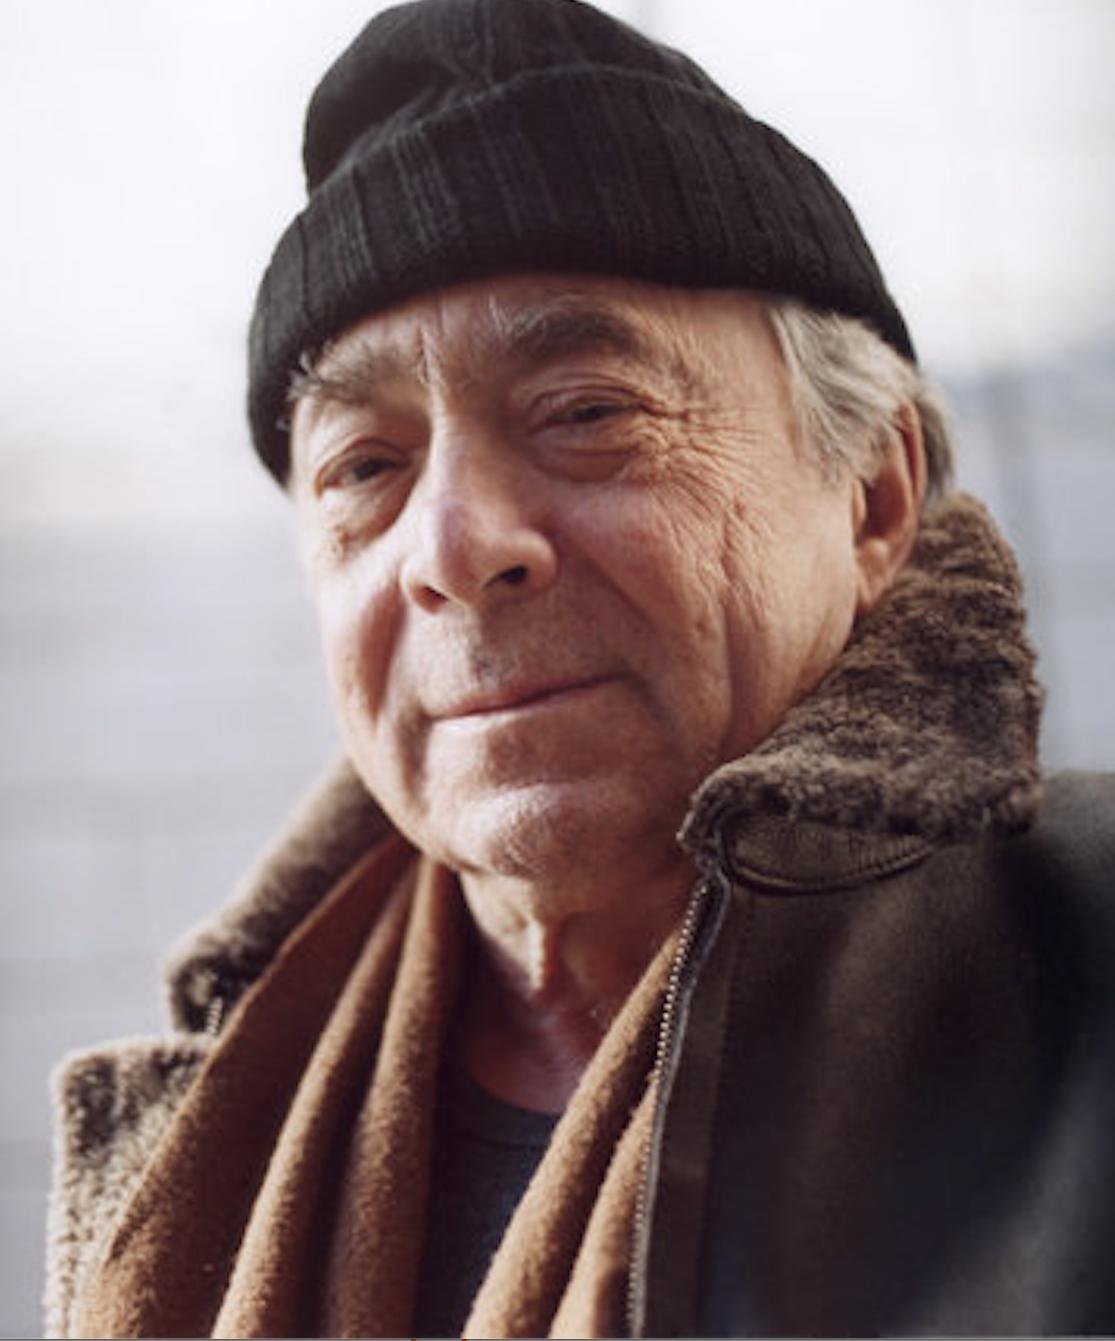 Walter Yetnikoff